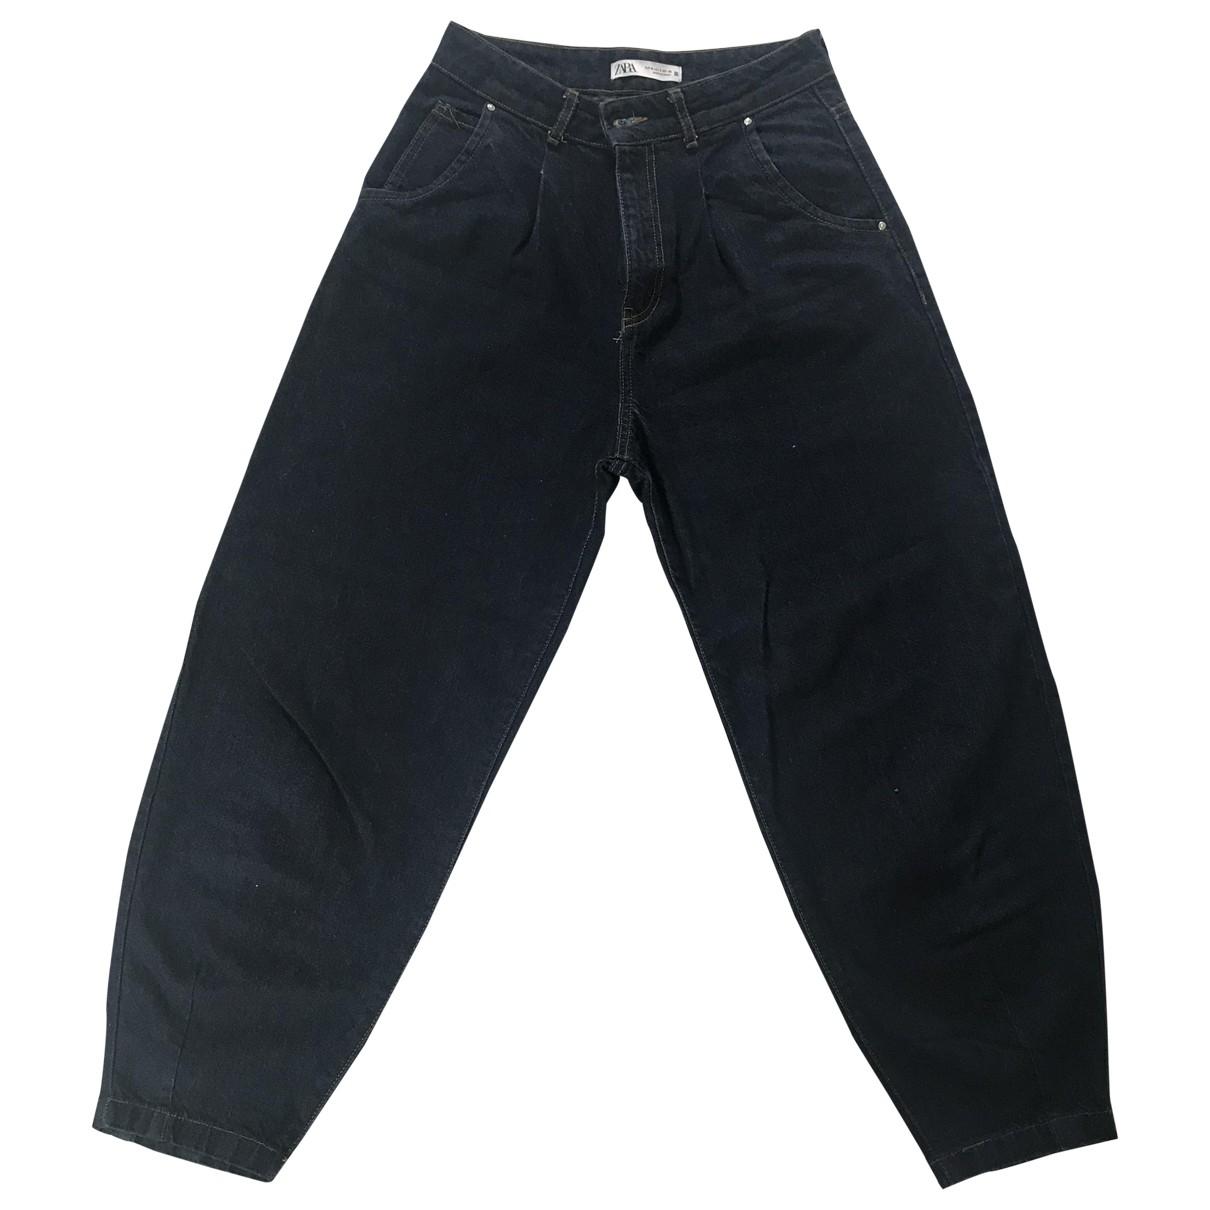 Zara \N Blue Cotton - elasthane Jeans for Women 38 FR